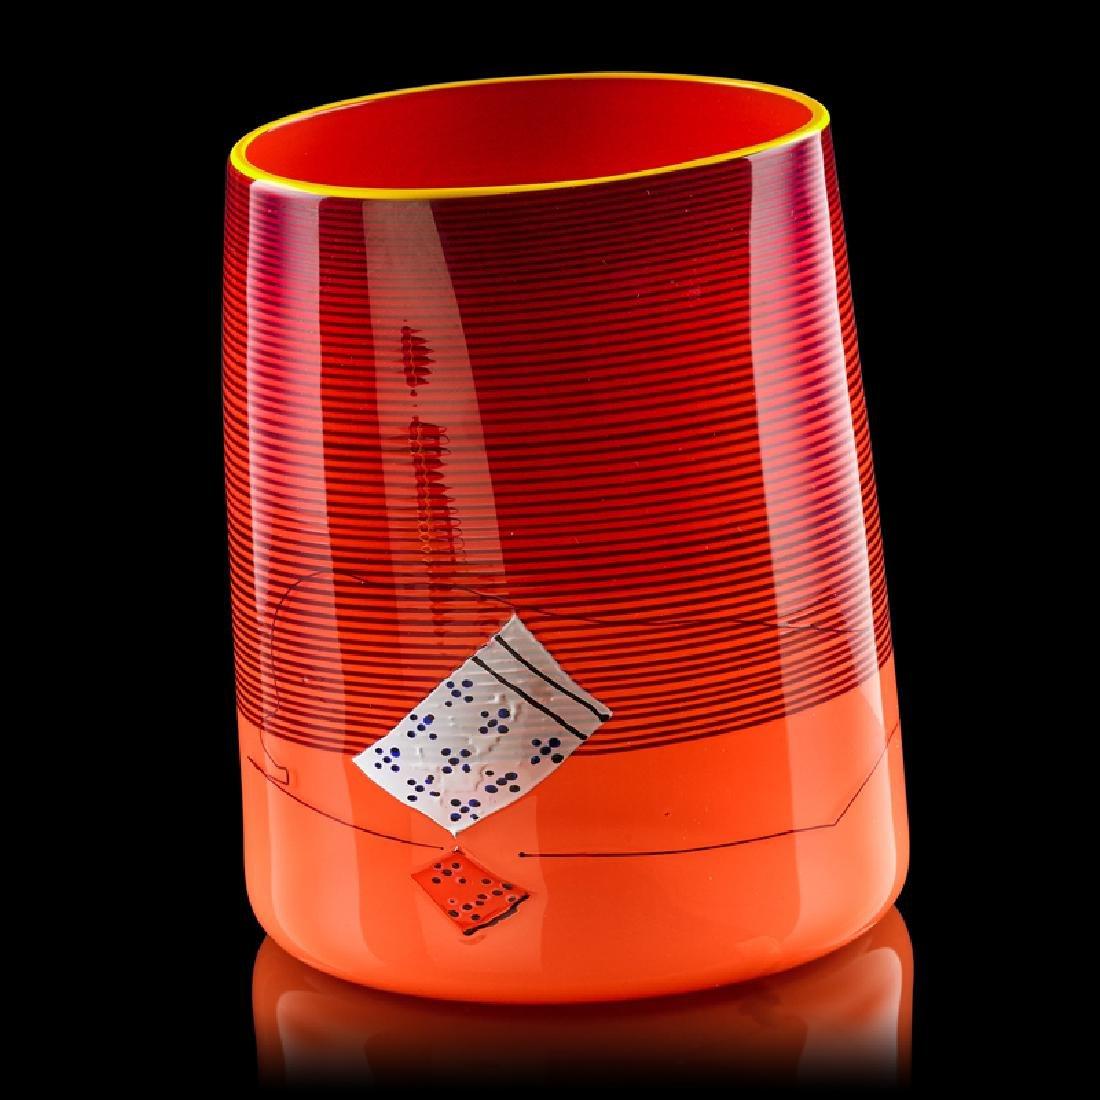 DALE CHIHULY  PORTLAND PRESS Red Blanket Cylinder